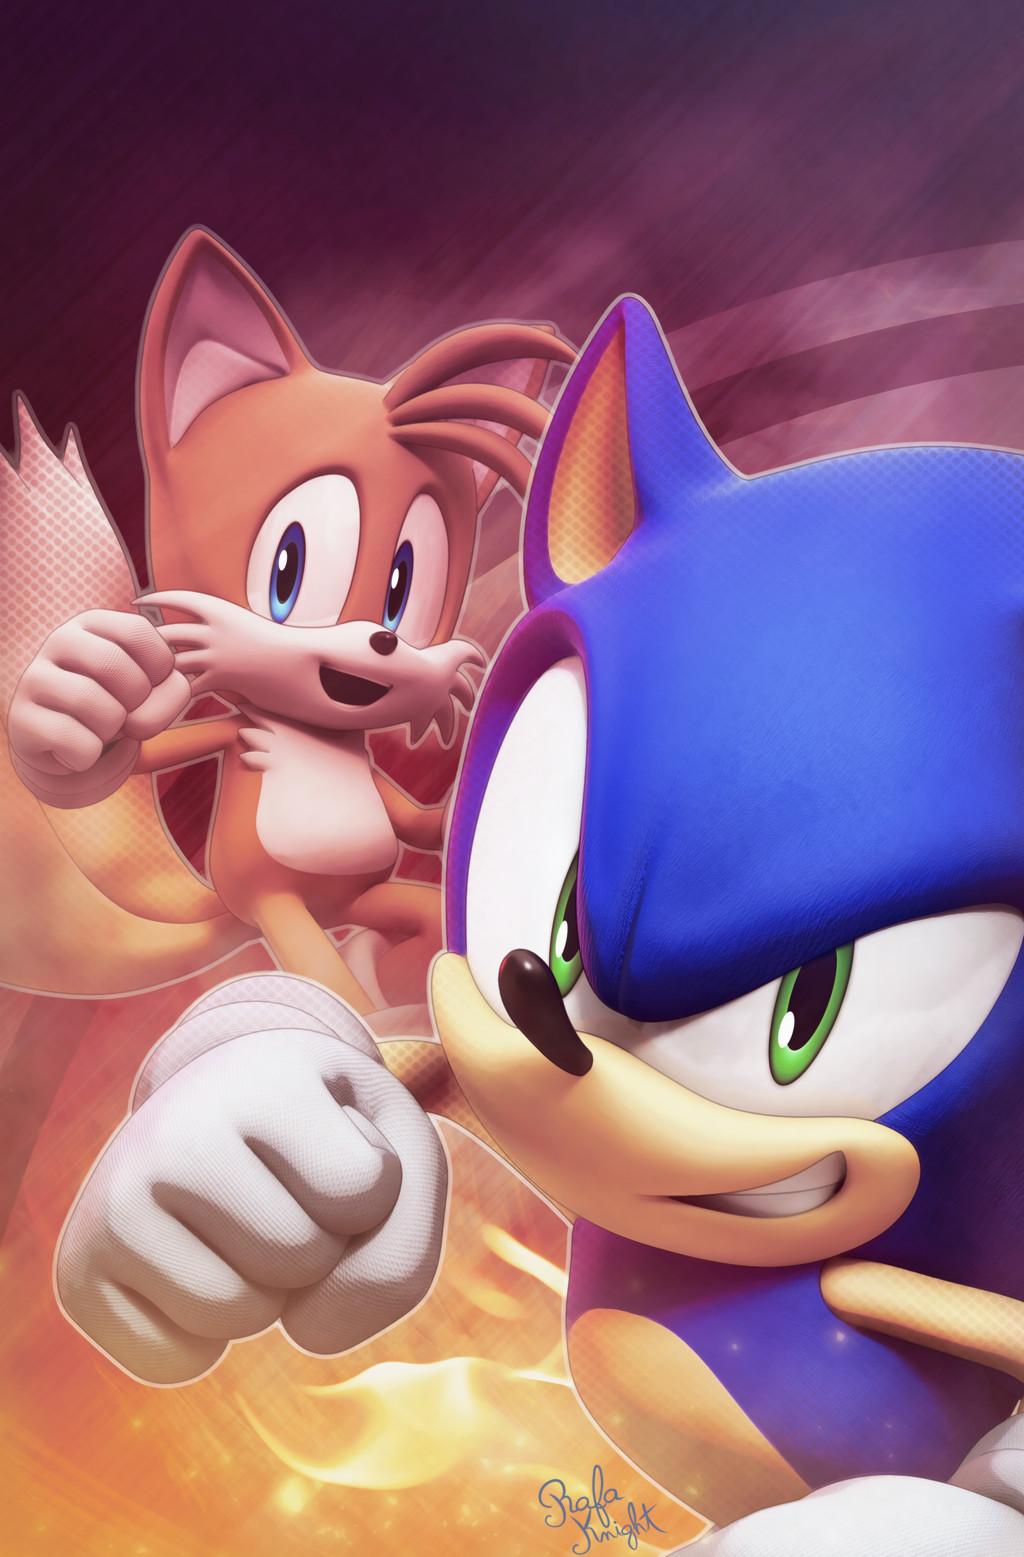 Artstation Sonic The Hedgehog 1 Variant Cover 2018 Rafa Knight